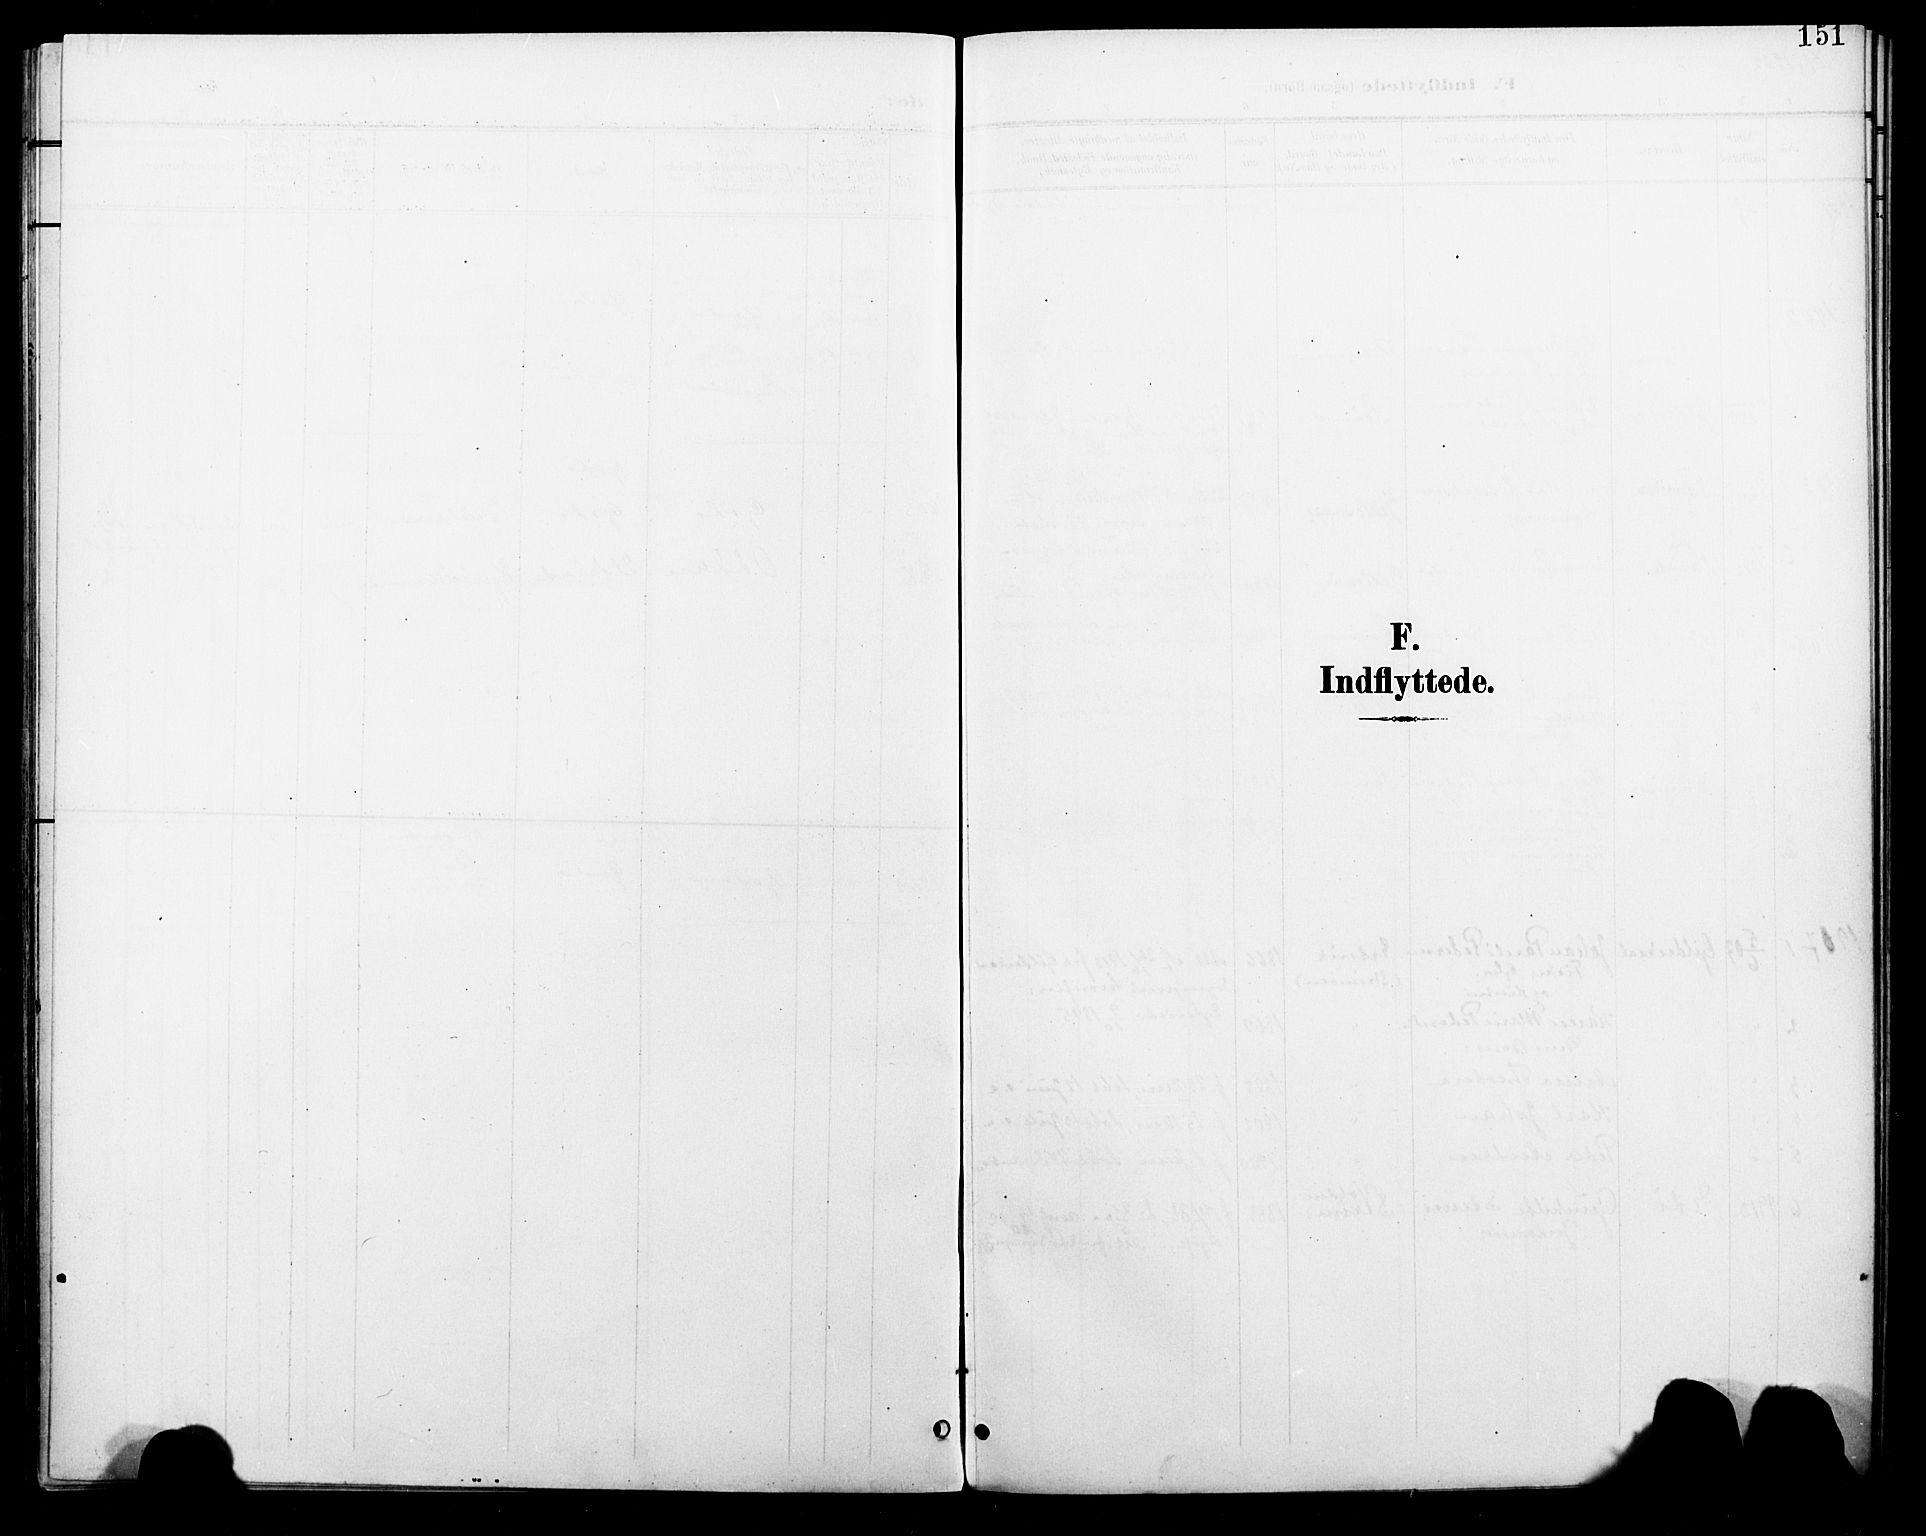 SAT, Ministerialprotokoller, klokkerbøker og fødselsregistre - Nordland, 804/L0088: Klokkerbok nr. 804C01, 1901-1917, s. 151